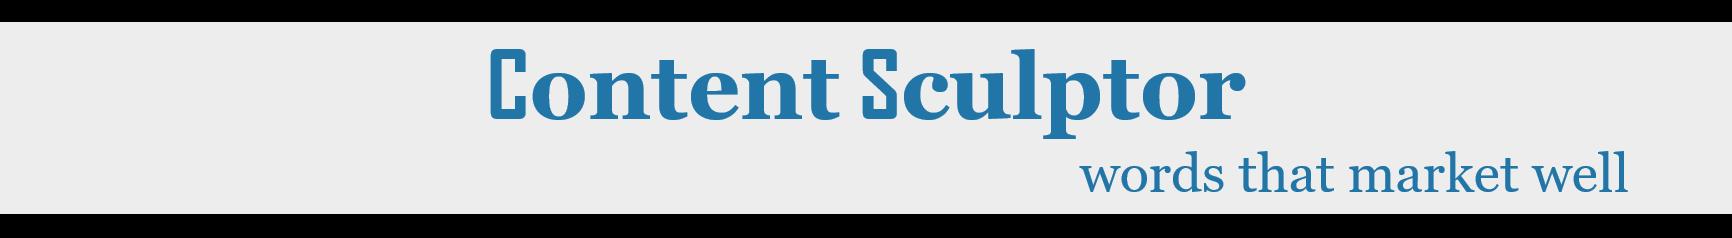 content sculptor brand name